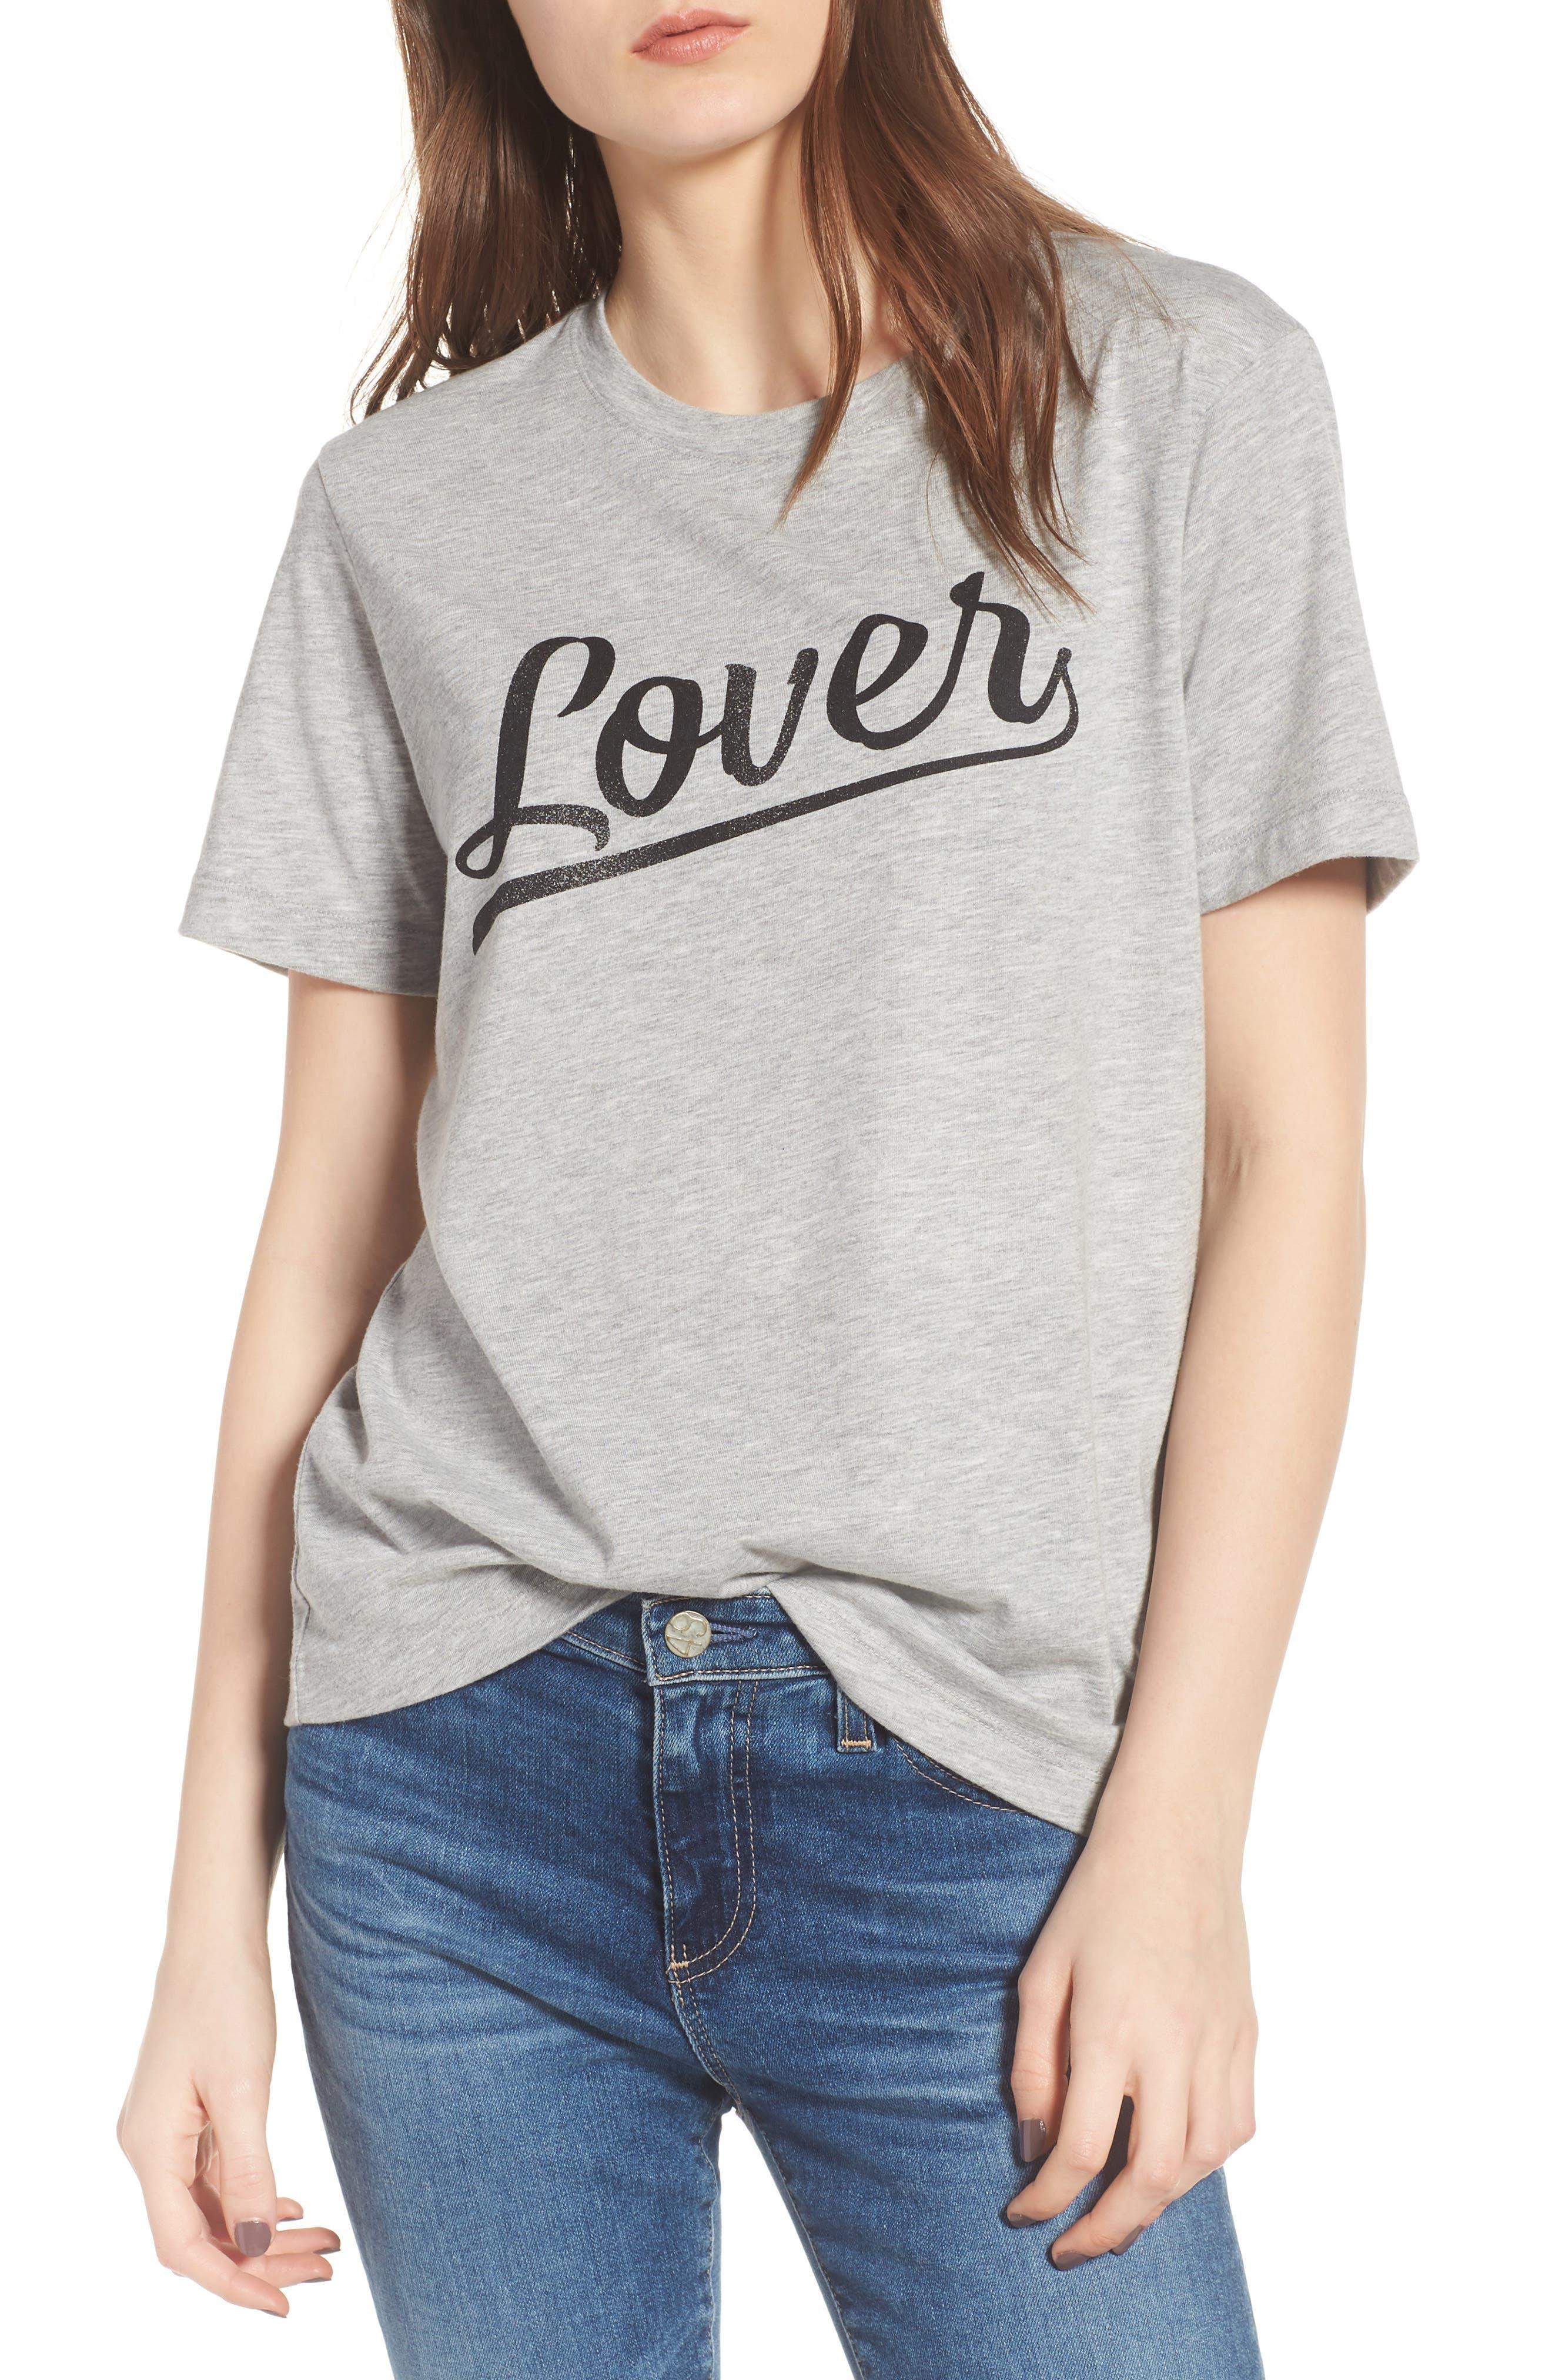 Lover Tee,                             Main thumbnail 1, color,                             Heather Grey/ Black